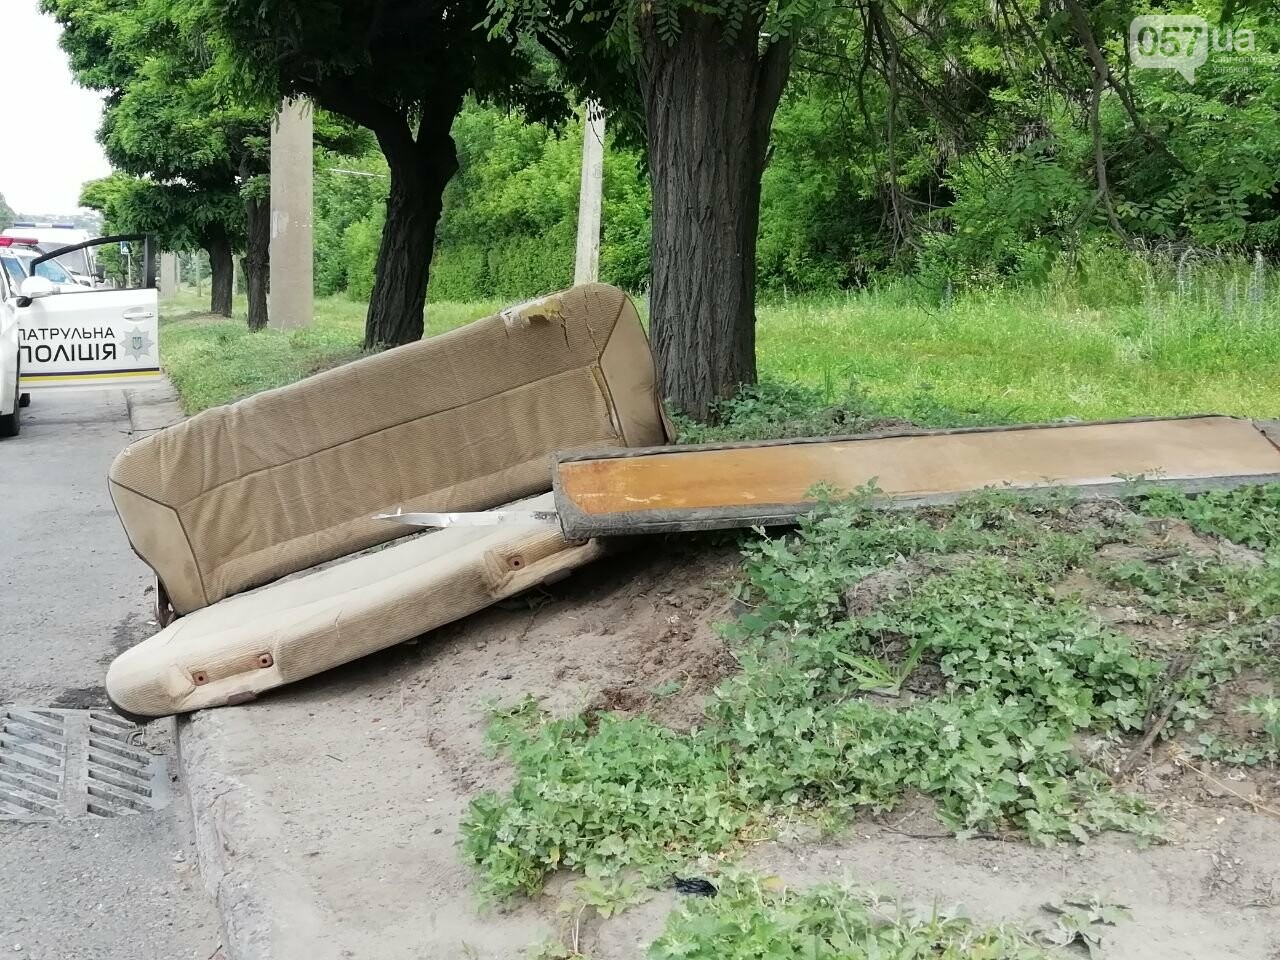 «Все сидели в крови»: подробности аварии на проспекте Тракторостроителей, - ФОТО, ВИДЕО, фото-7